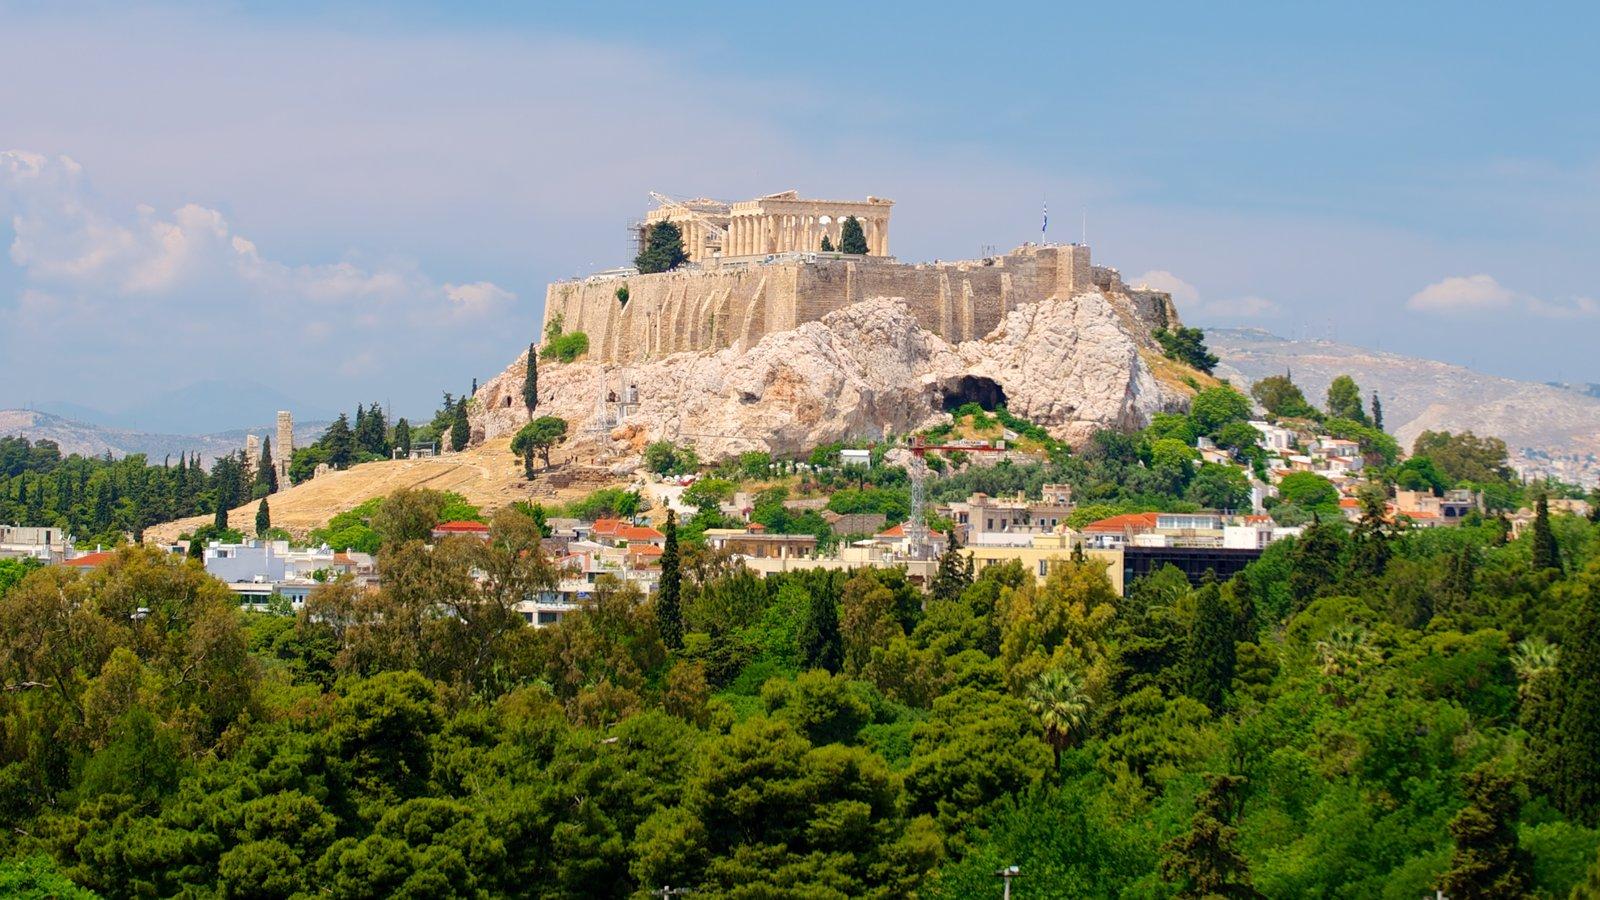 Acrópole caracterizando elementos de patrimônio, ruínas de edifício e montanhas